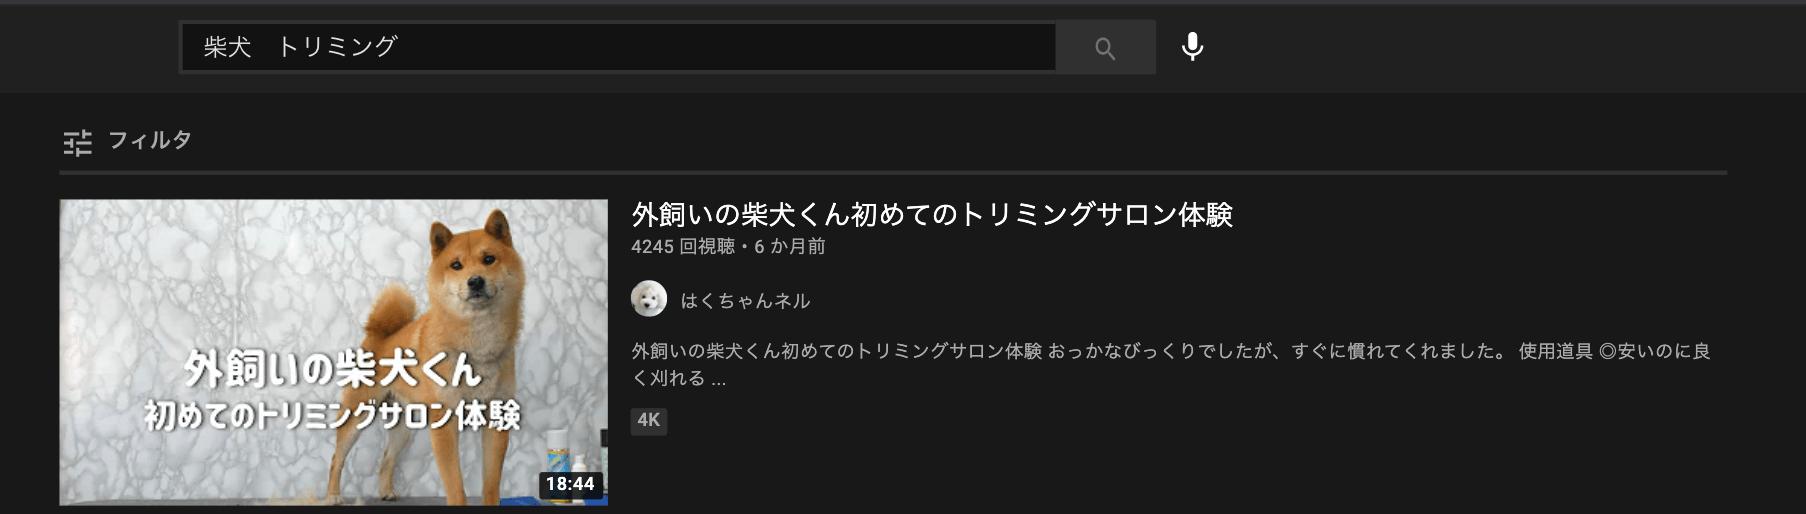 youtube-sibainu trimming-top display